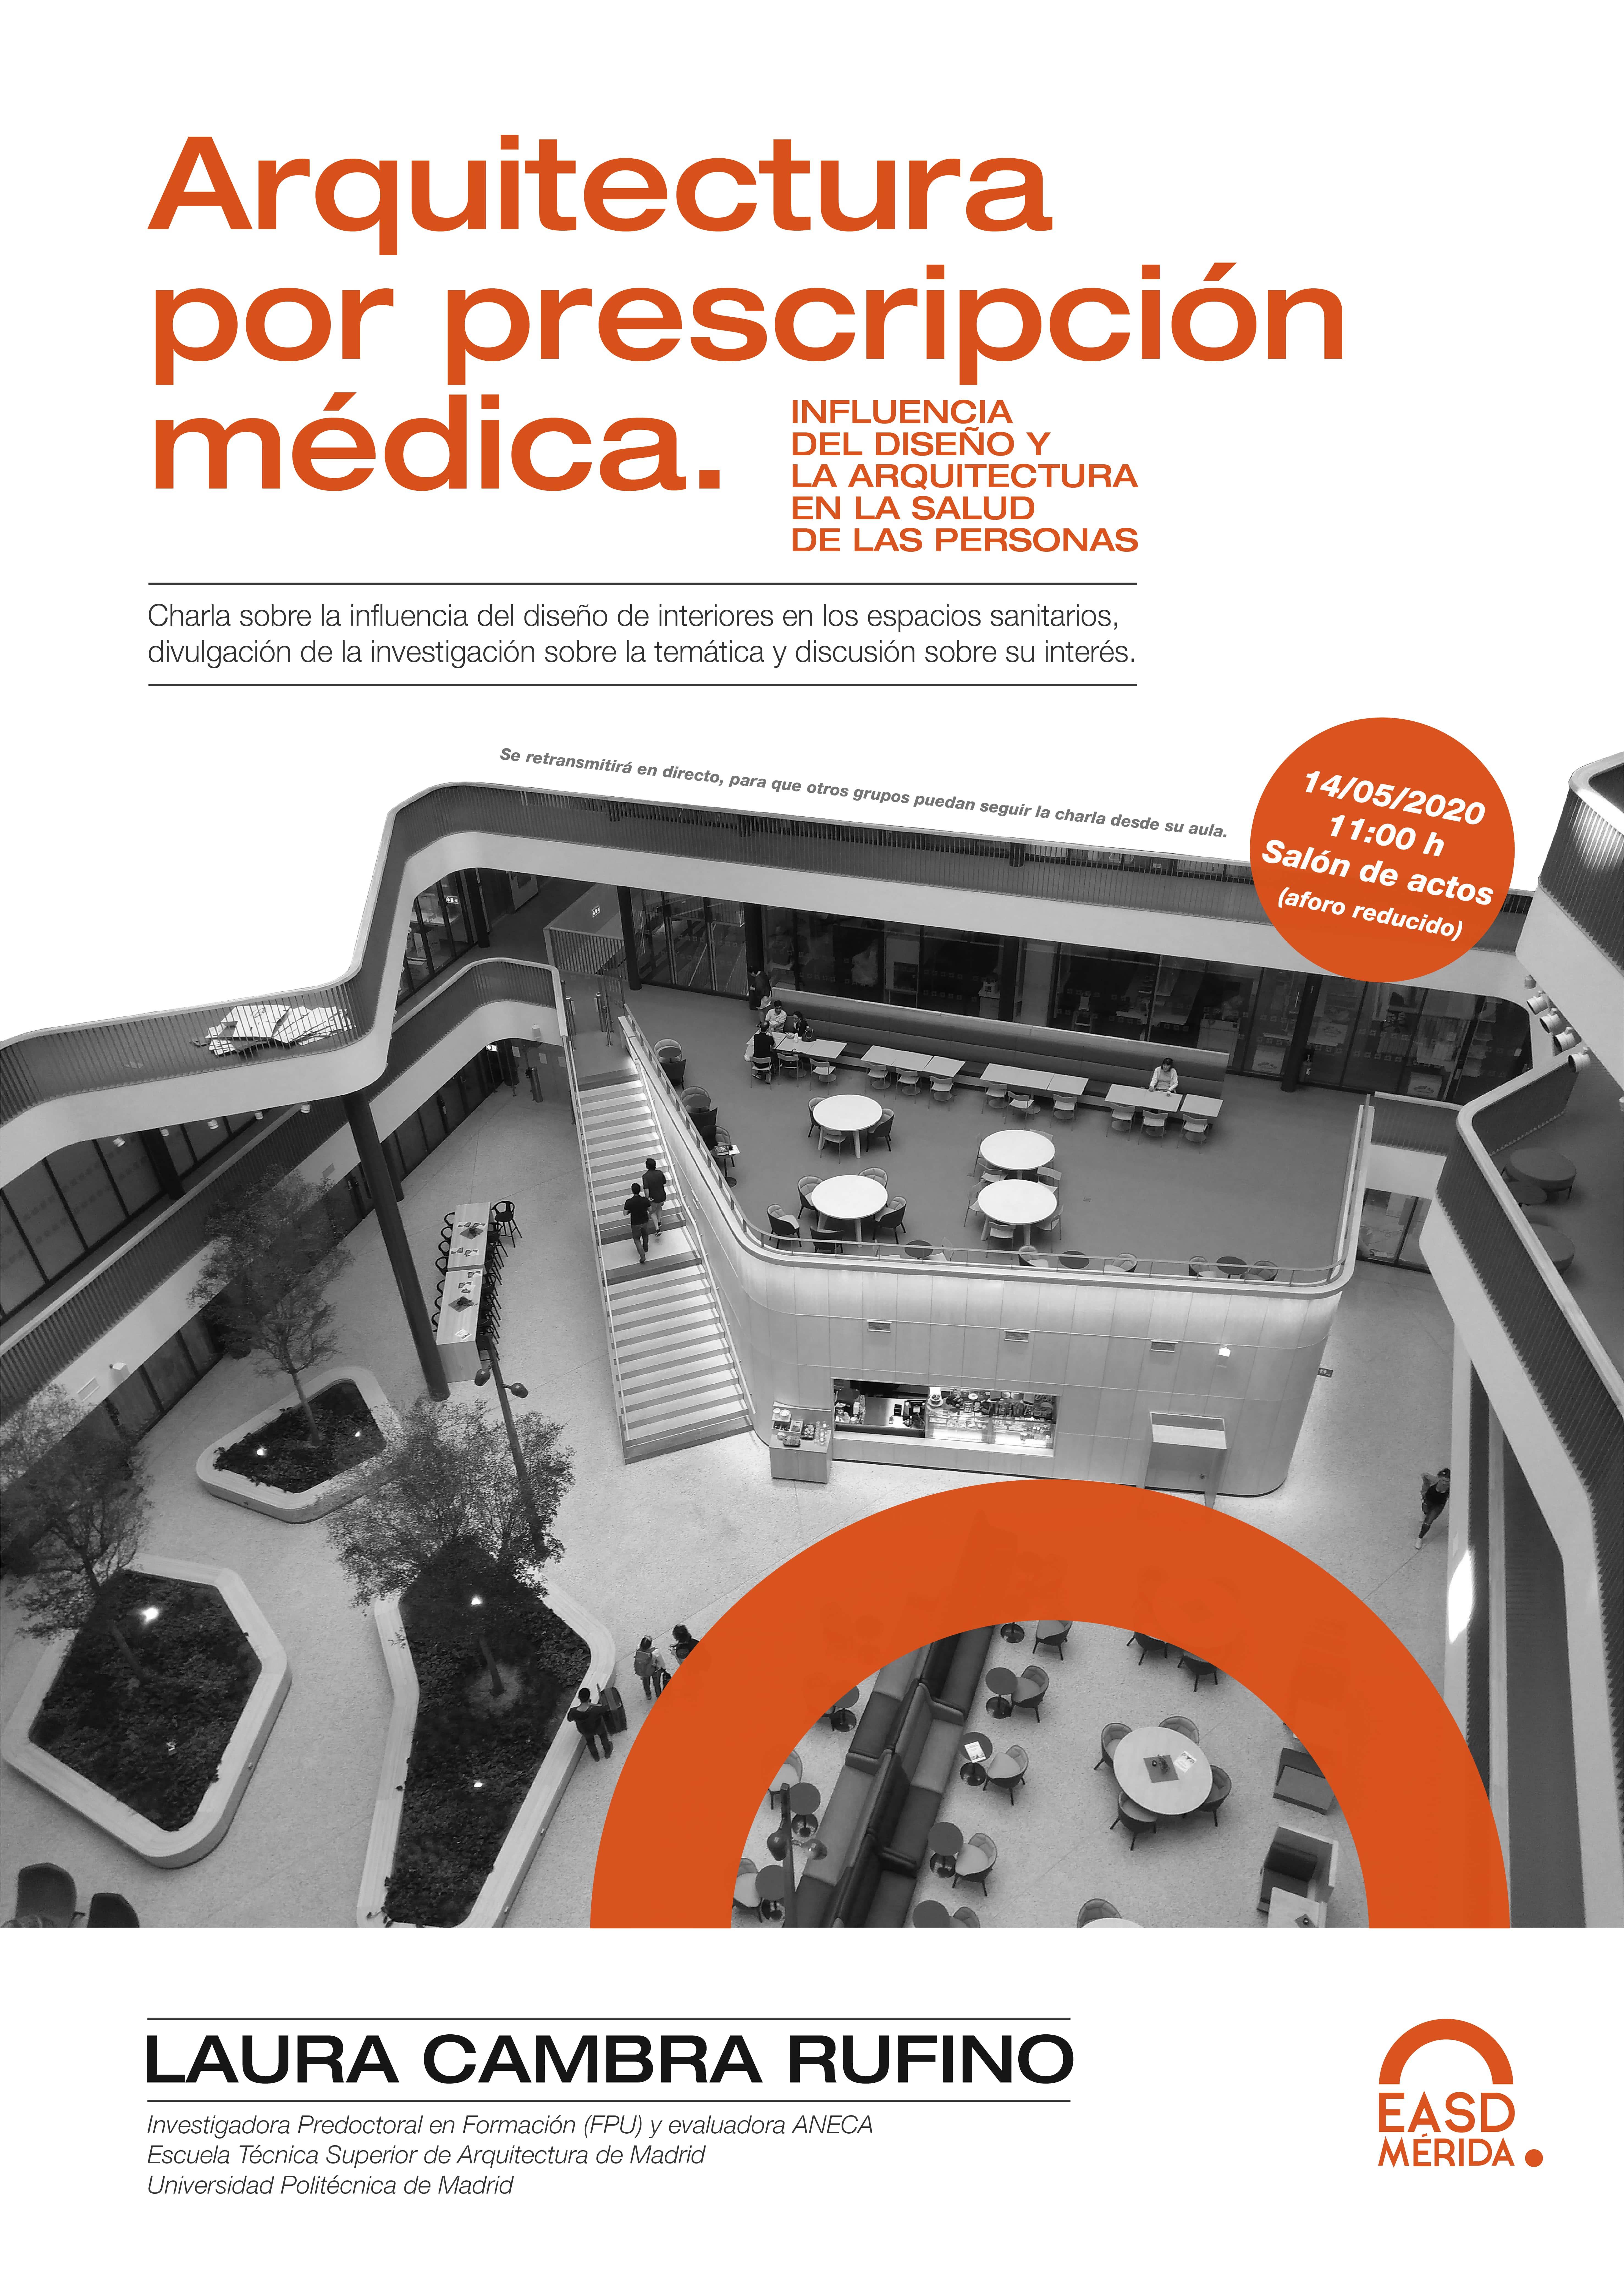 Arquitectura por prescripción médica. Laura Cambra Rufino